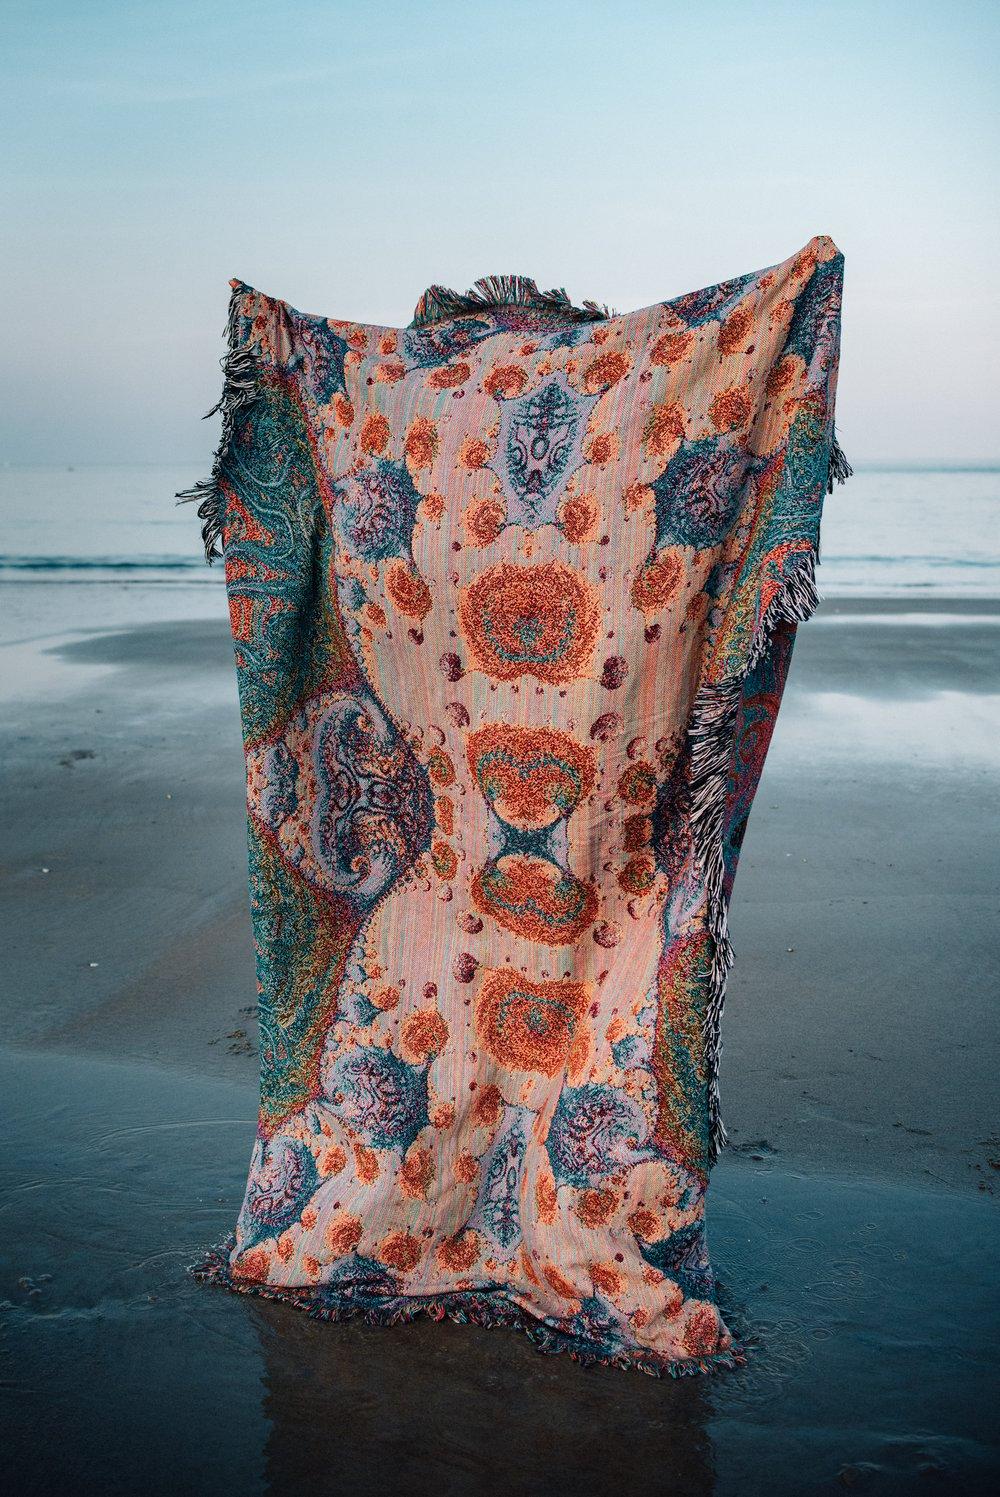 XL Woven Blanket #5